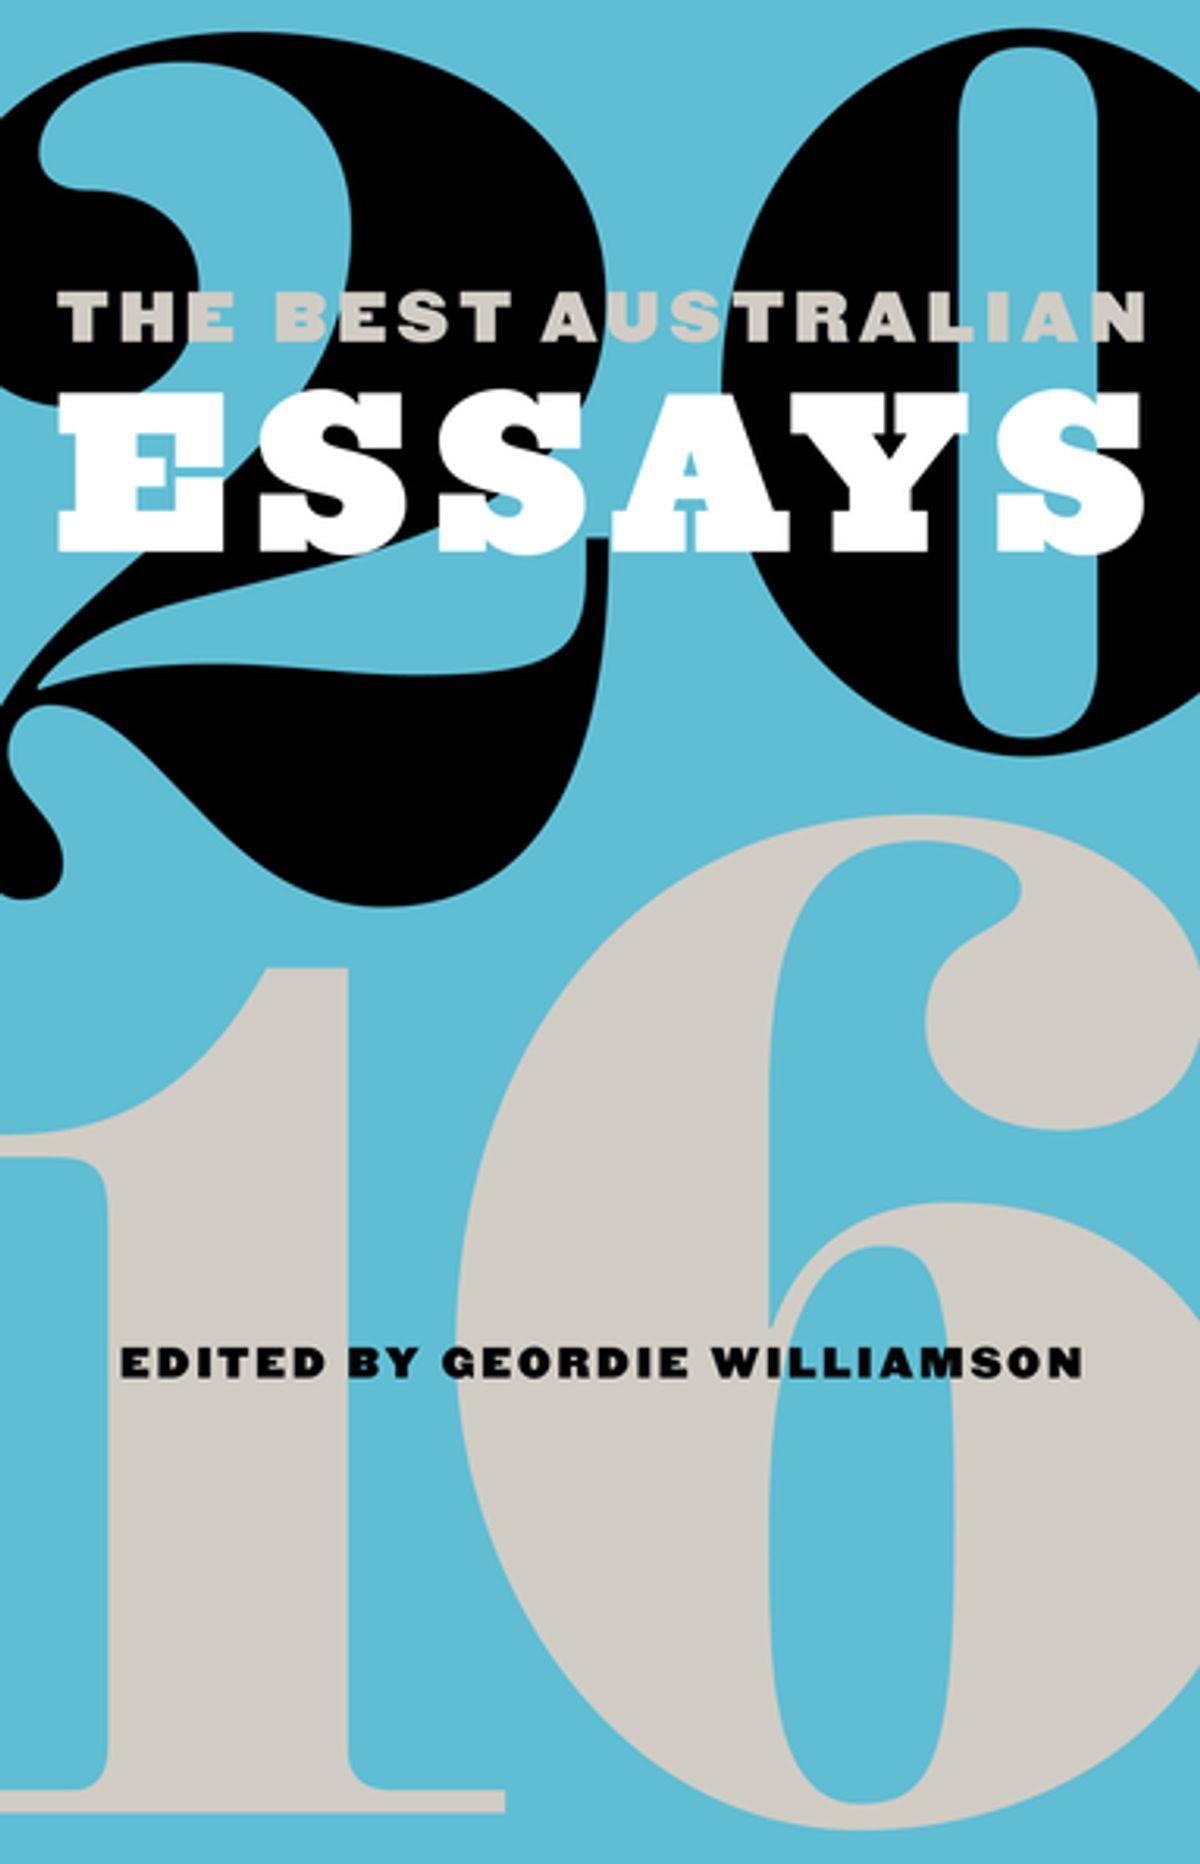 009 The Best Australian Essays Essay Breathtaking 2016 American Audiobook Short Pdf Full